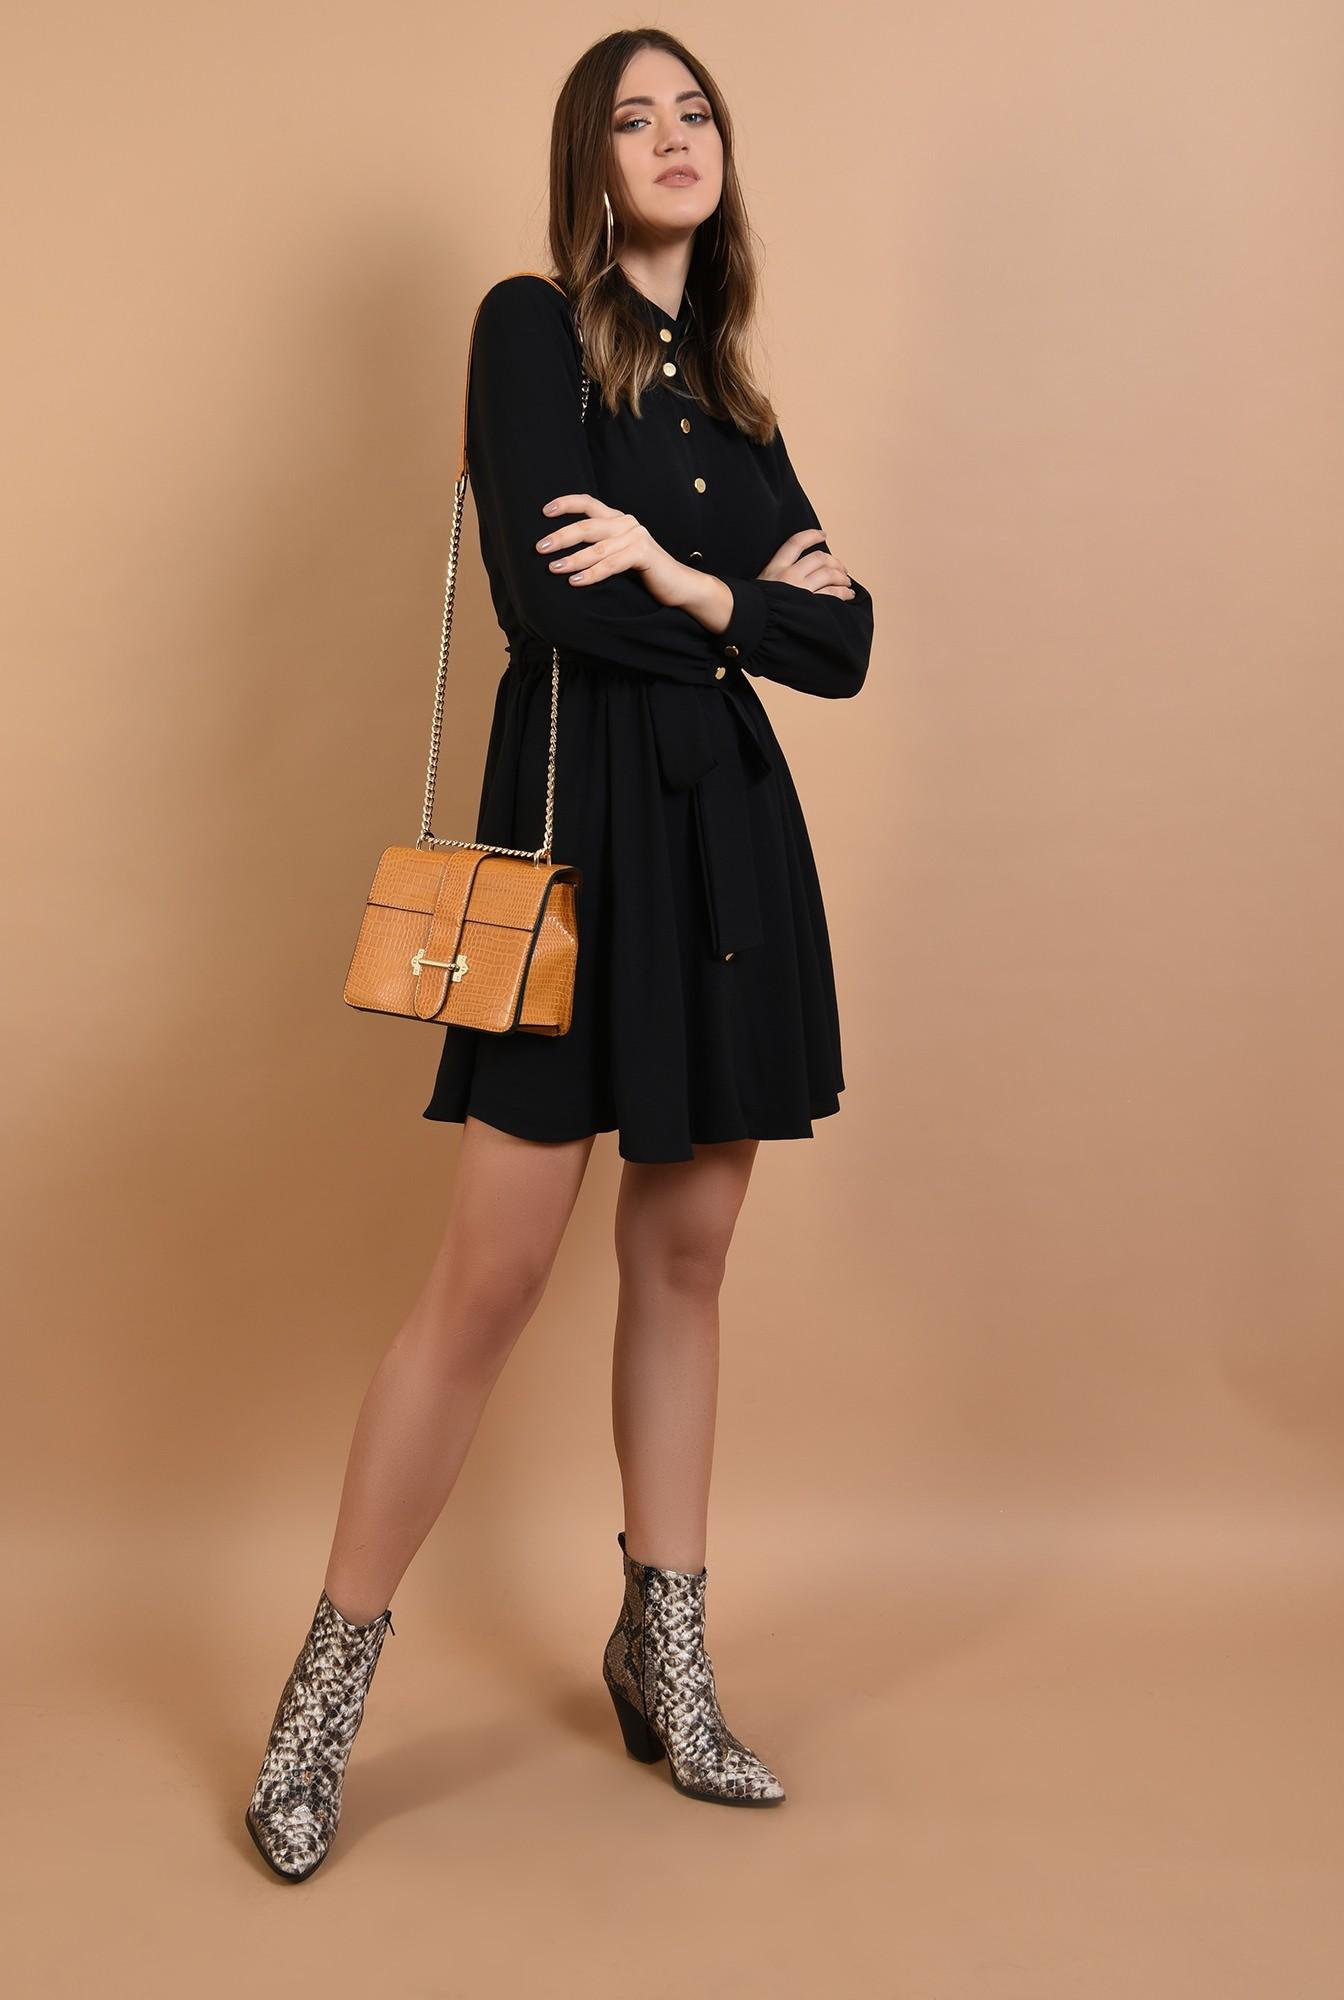 3 - rochie neagra, scurta, cu nasturi, cordon, Poema